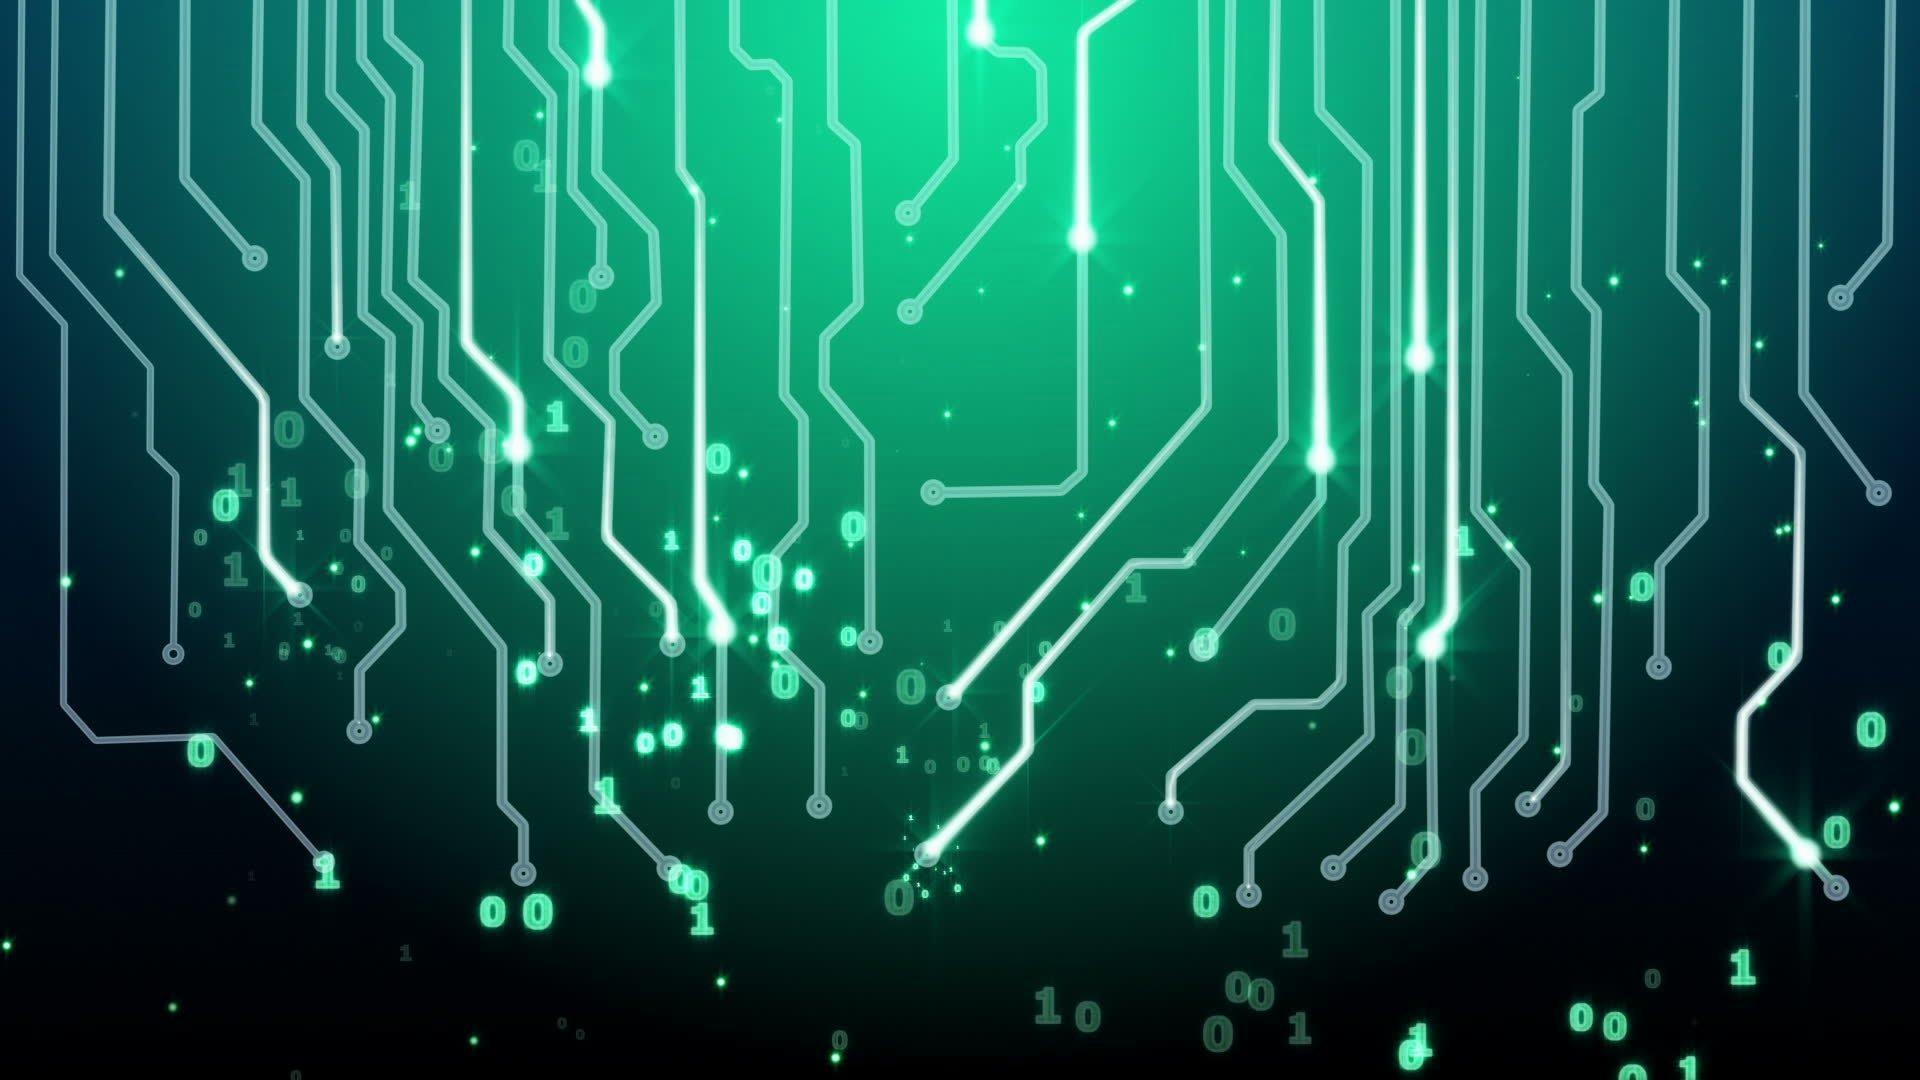 Iphone X Motherboard Wallpaper Circuit Board Wallpaper 183 ①